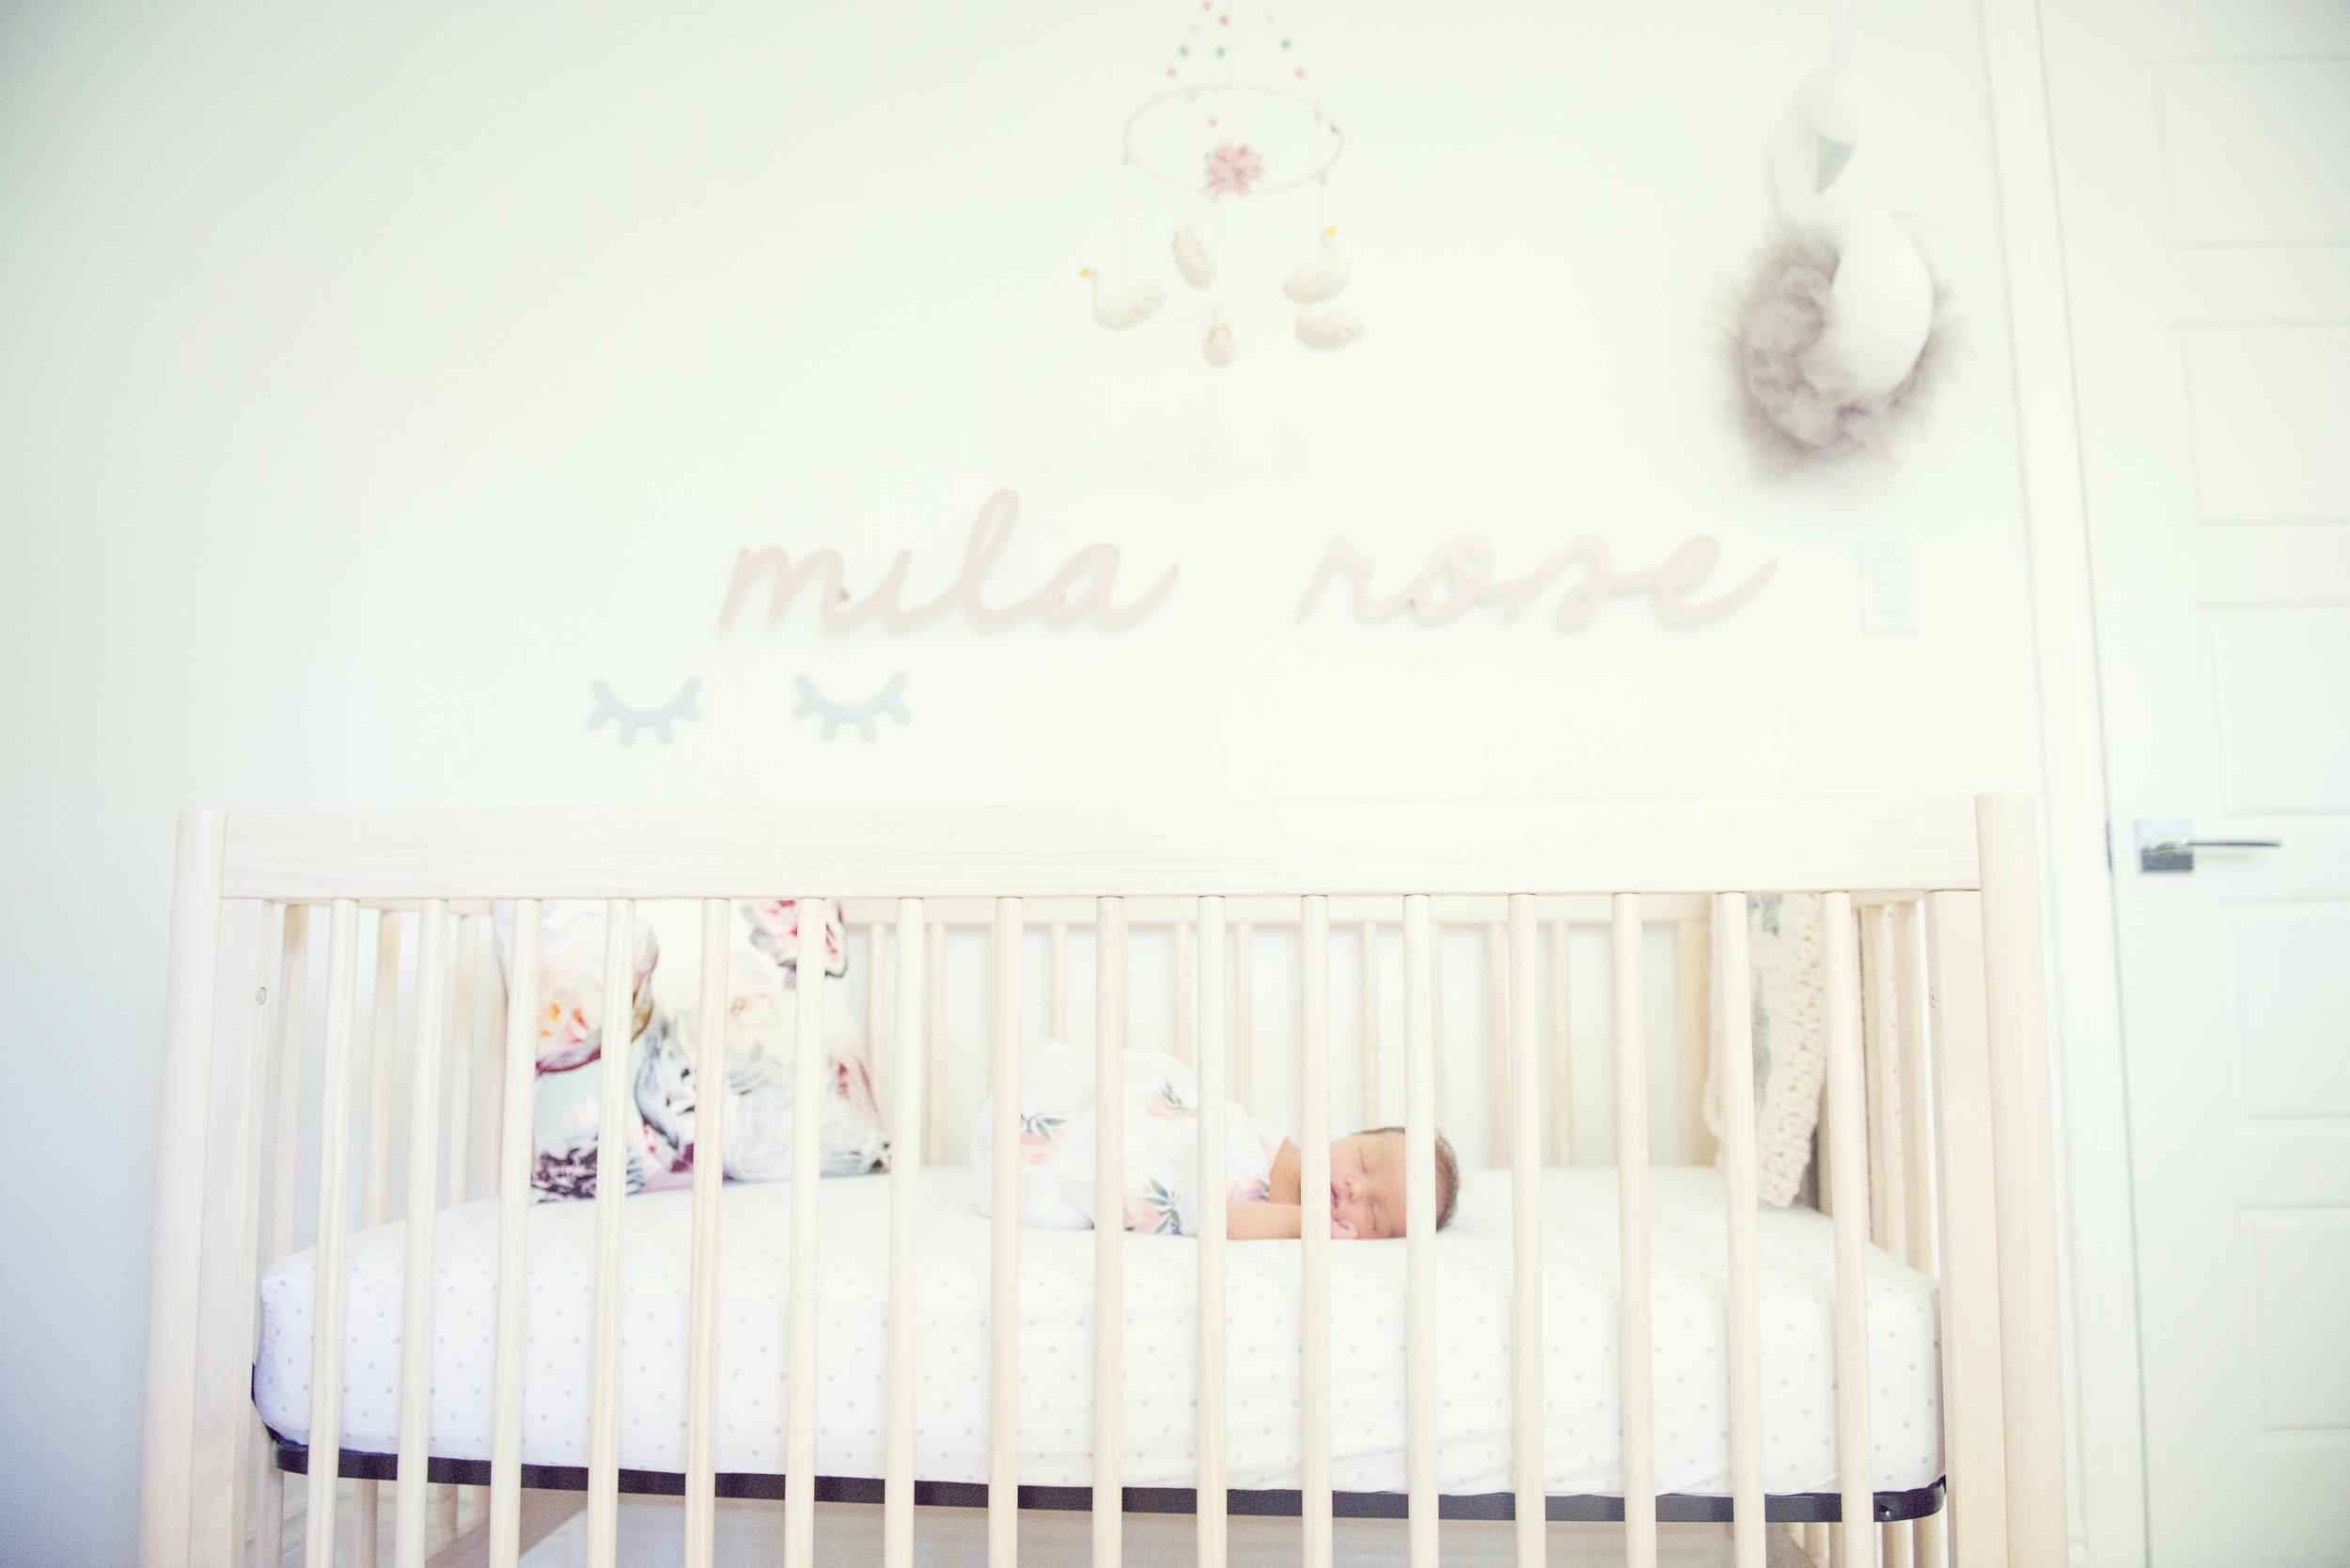 milas_newbornsession-157.jpg